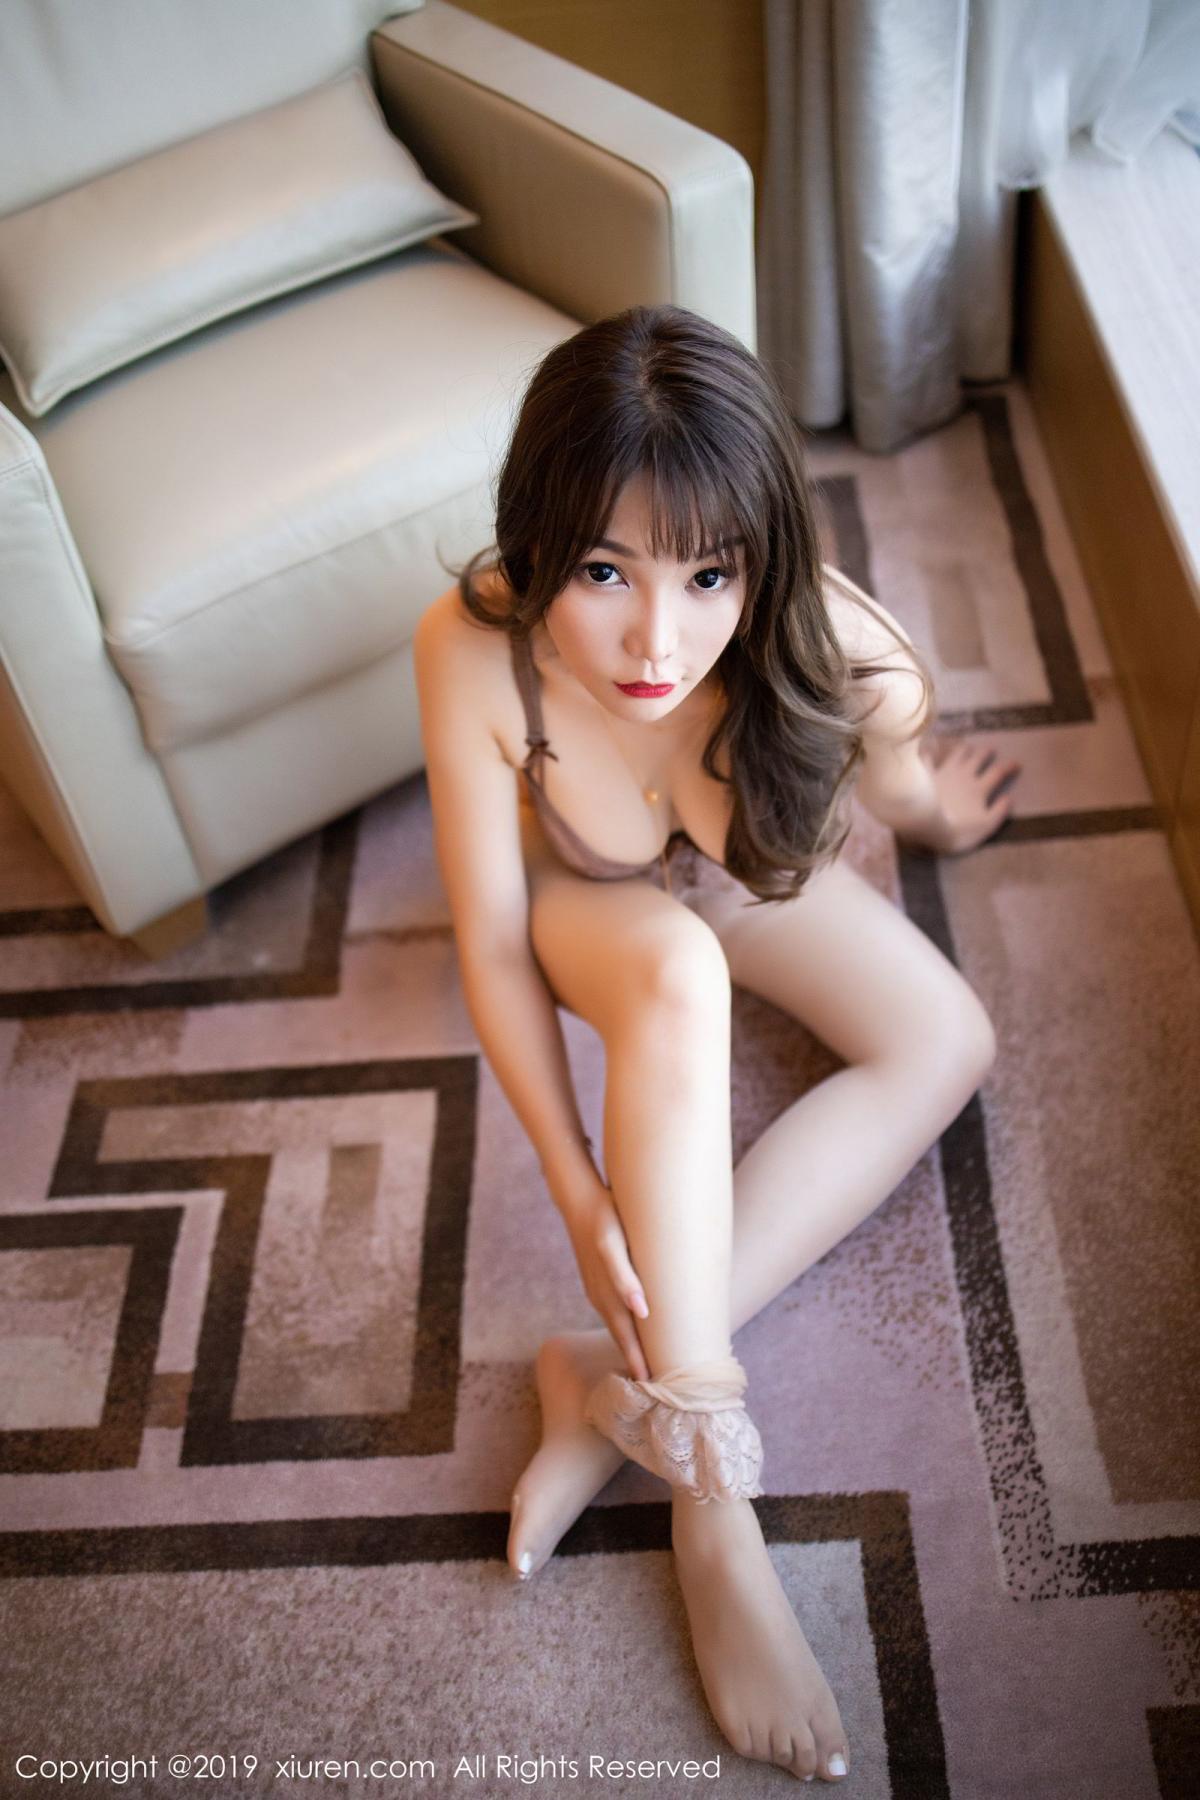 [XiuRen] Vol.1675 Chen Zhi 58P, Chen Zhi, Cheongsam, Tall, Underwear, Xiuren